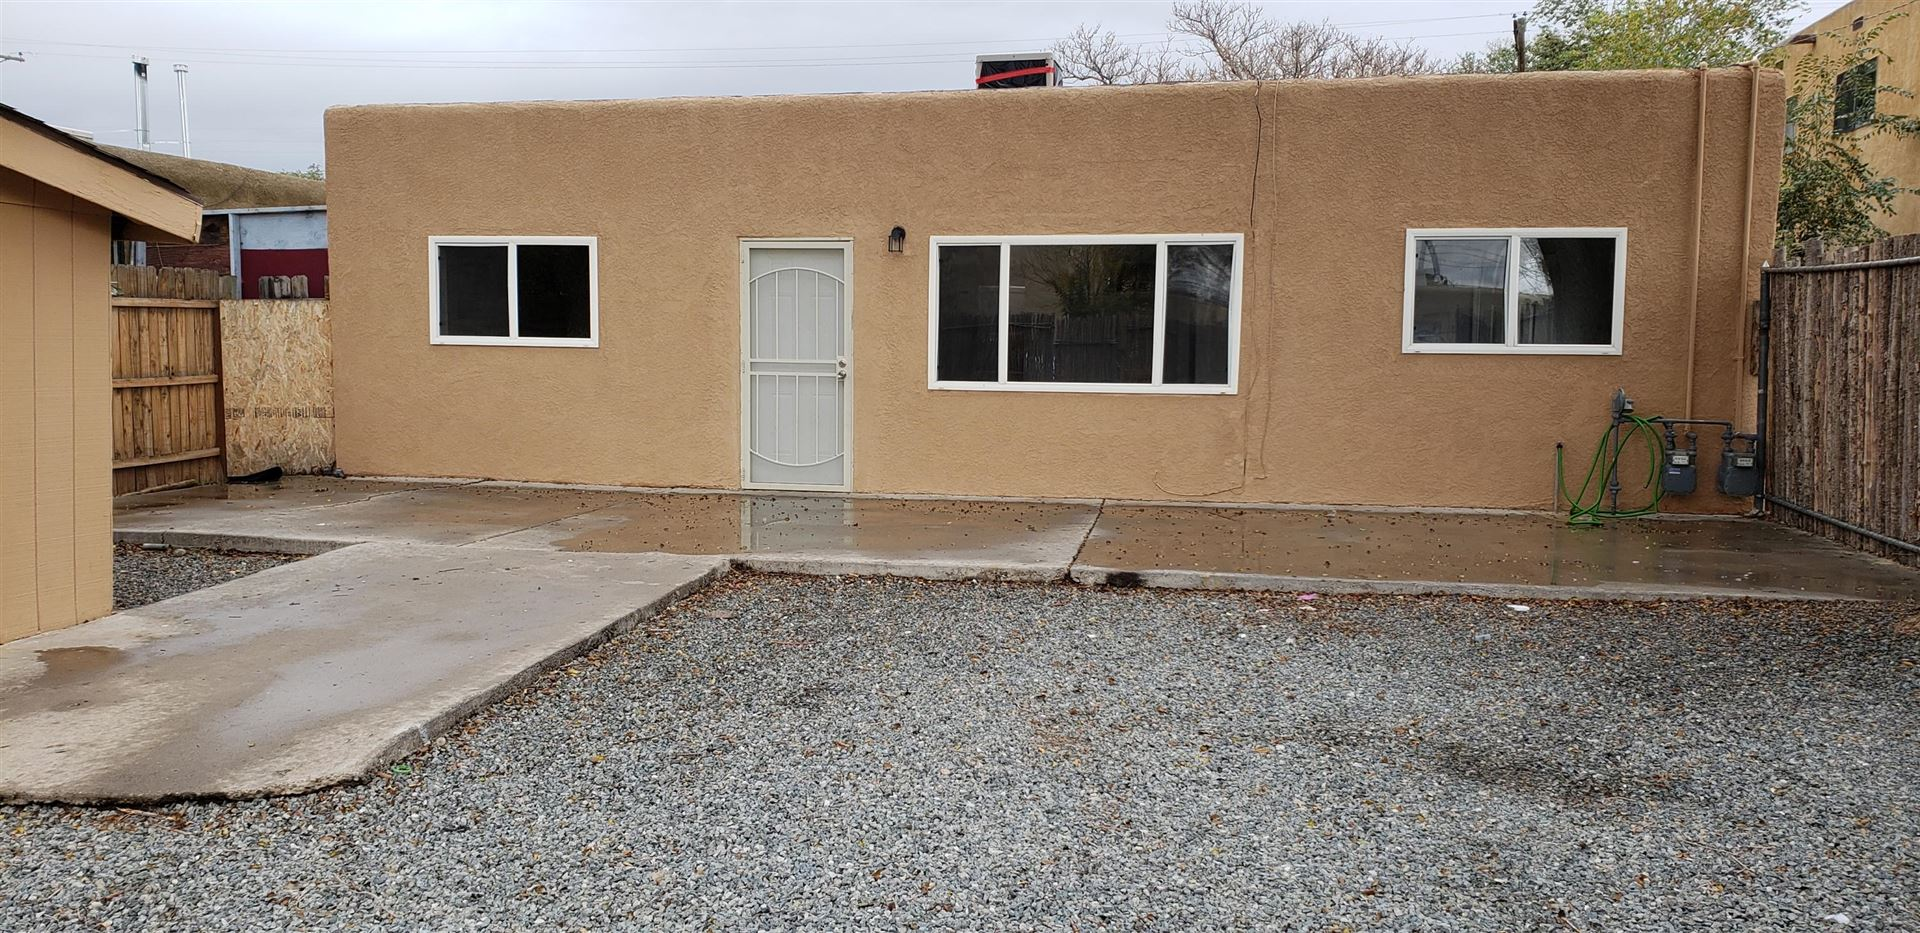 312 PENNSYLVANIA Street NE, Albuquerque, NM 87108 - #: 978671